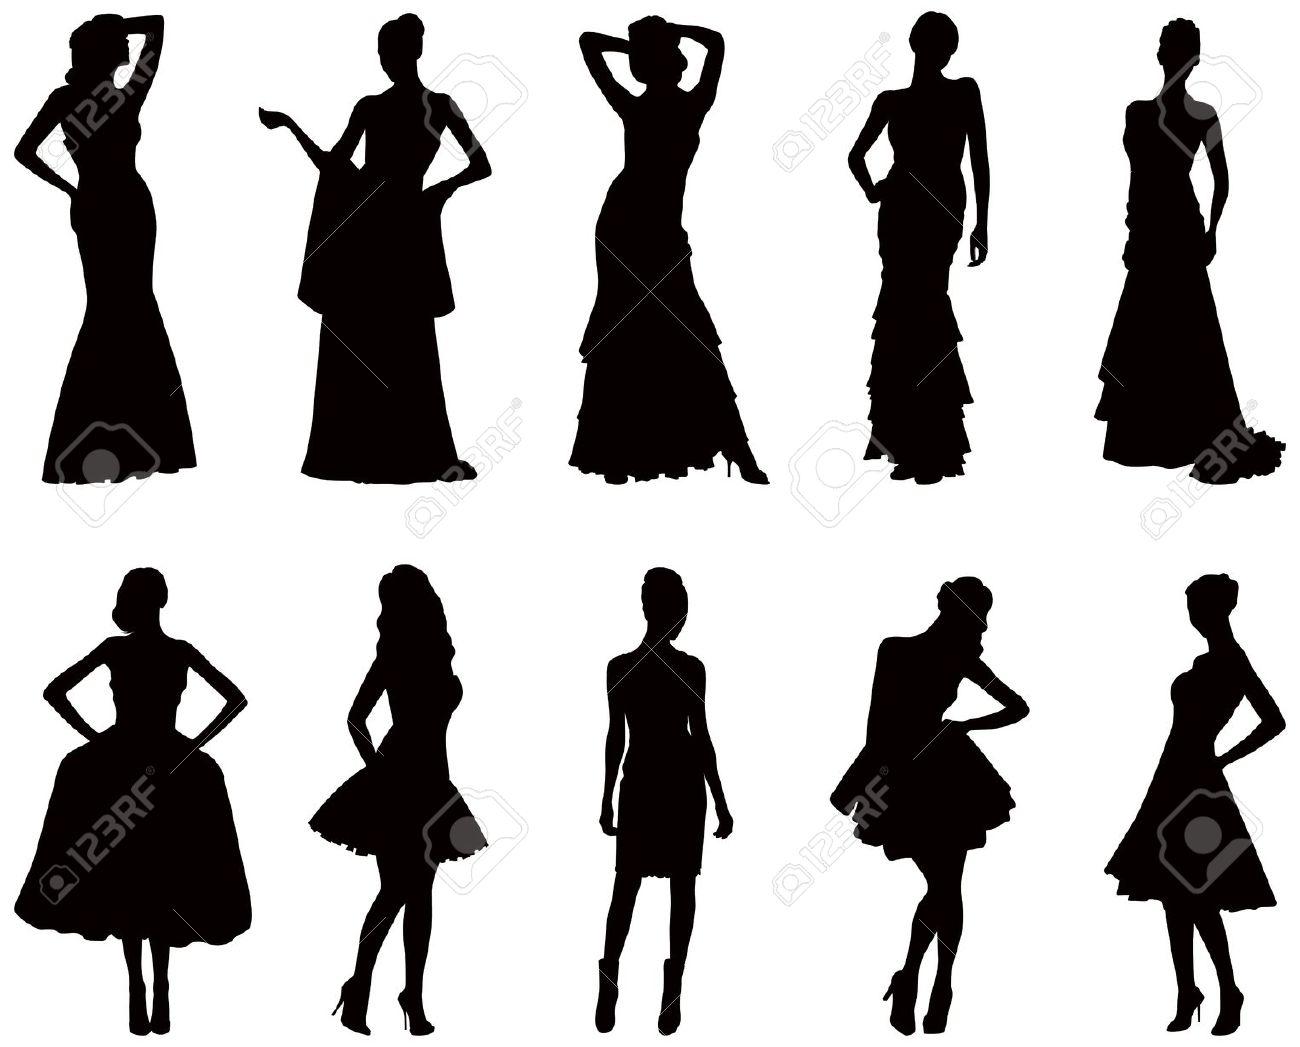 Black Woman Silhouette Clip Art Dresses - Hot Girls Wallpaper